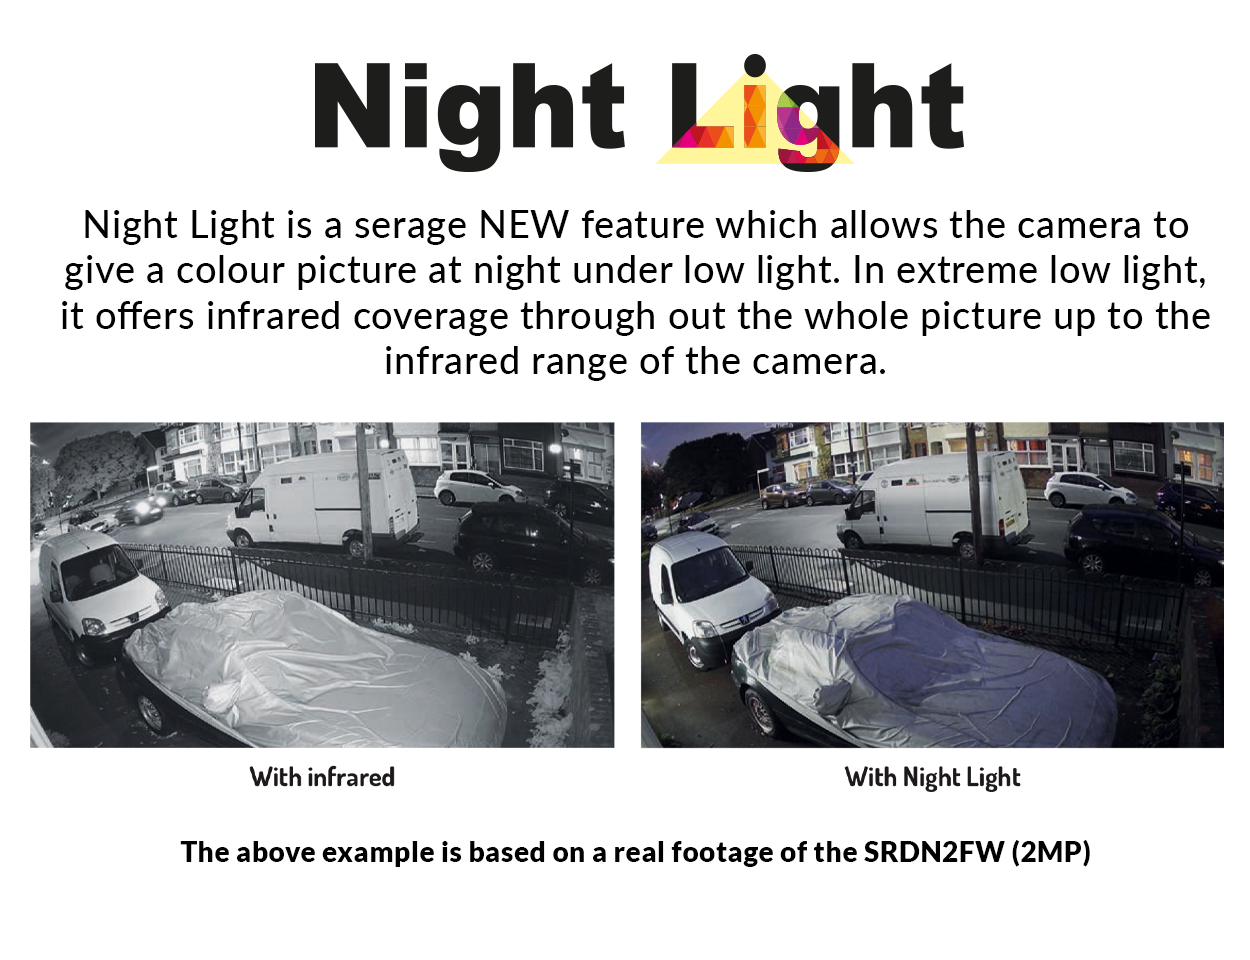 night-light-2.png